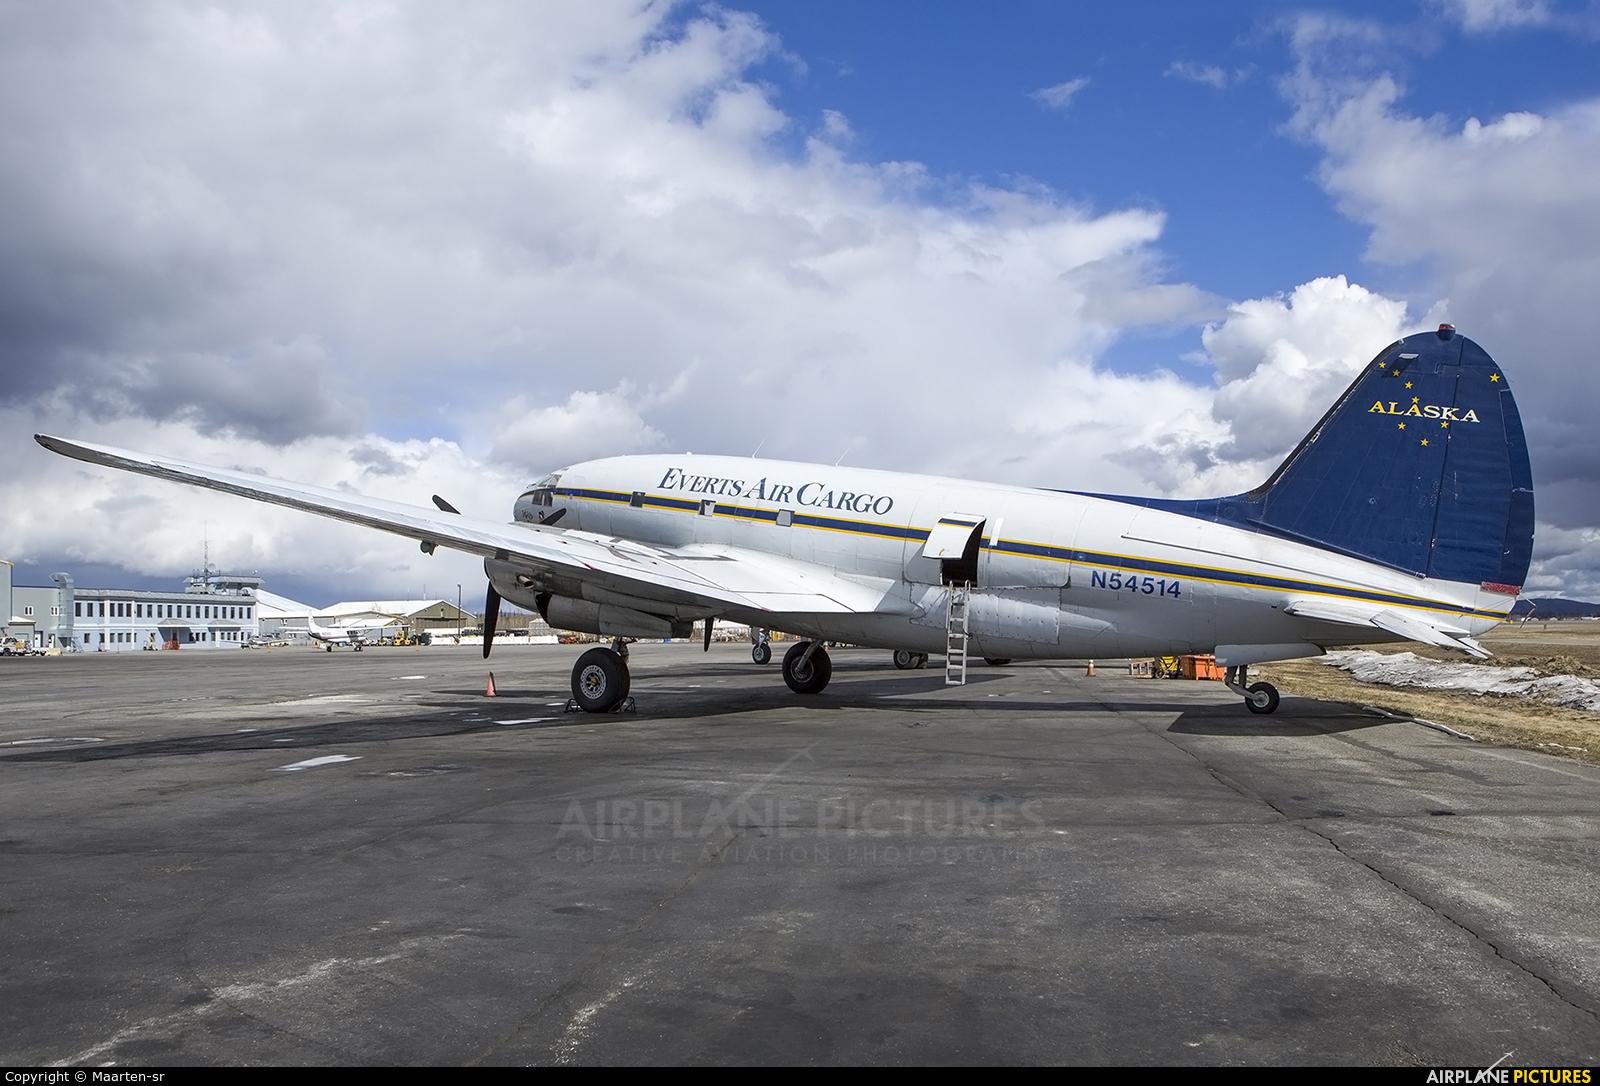 Everts Air Cargo N54514 aircraft at Fairbanks Intl